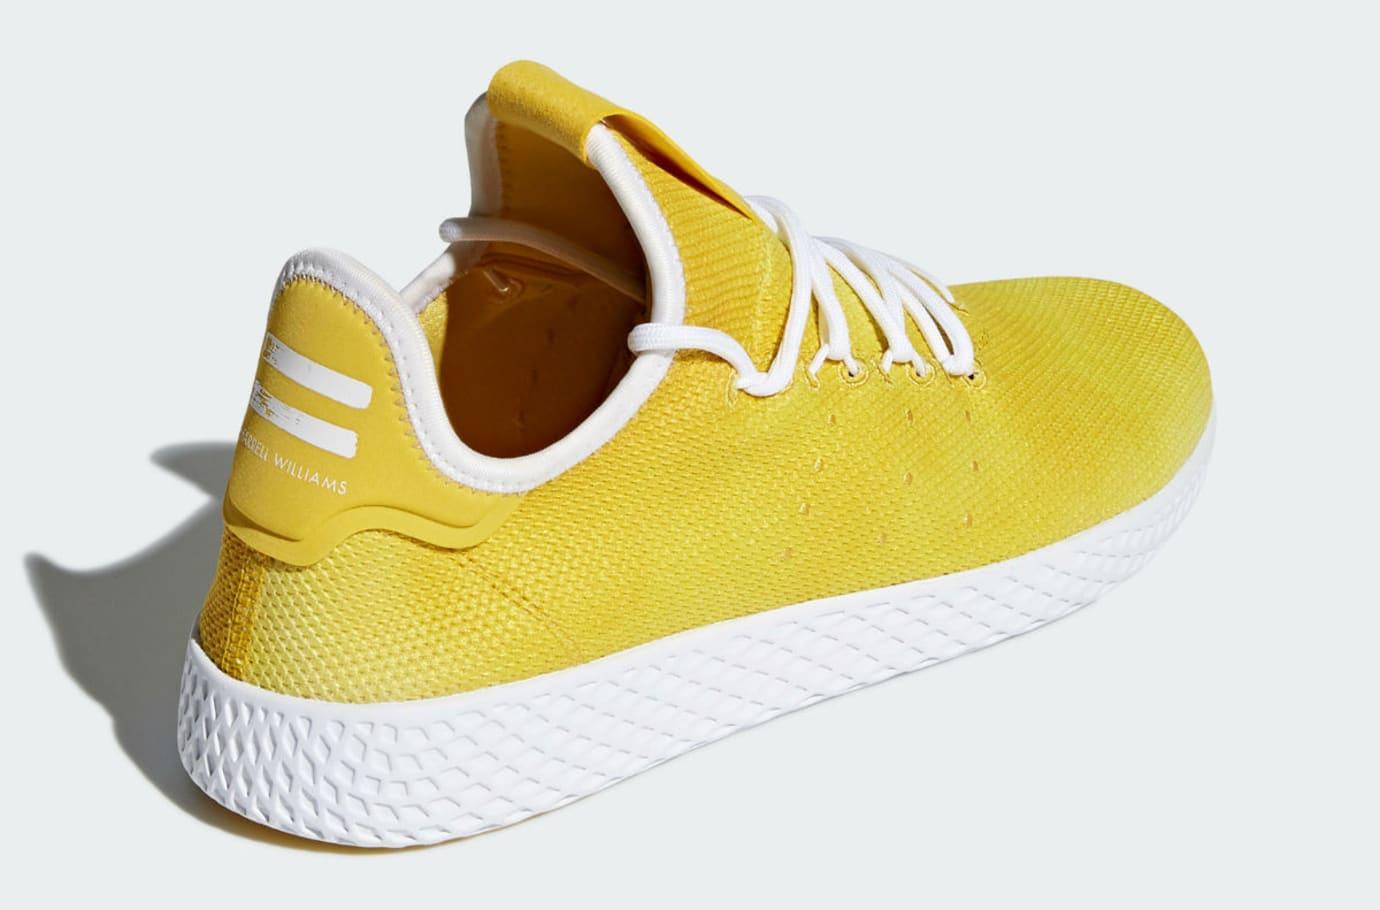 Pharrell x Adidas Tennis Hu Holi Bright Yellow Release Date DA9617 Back